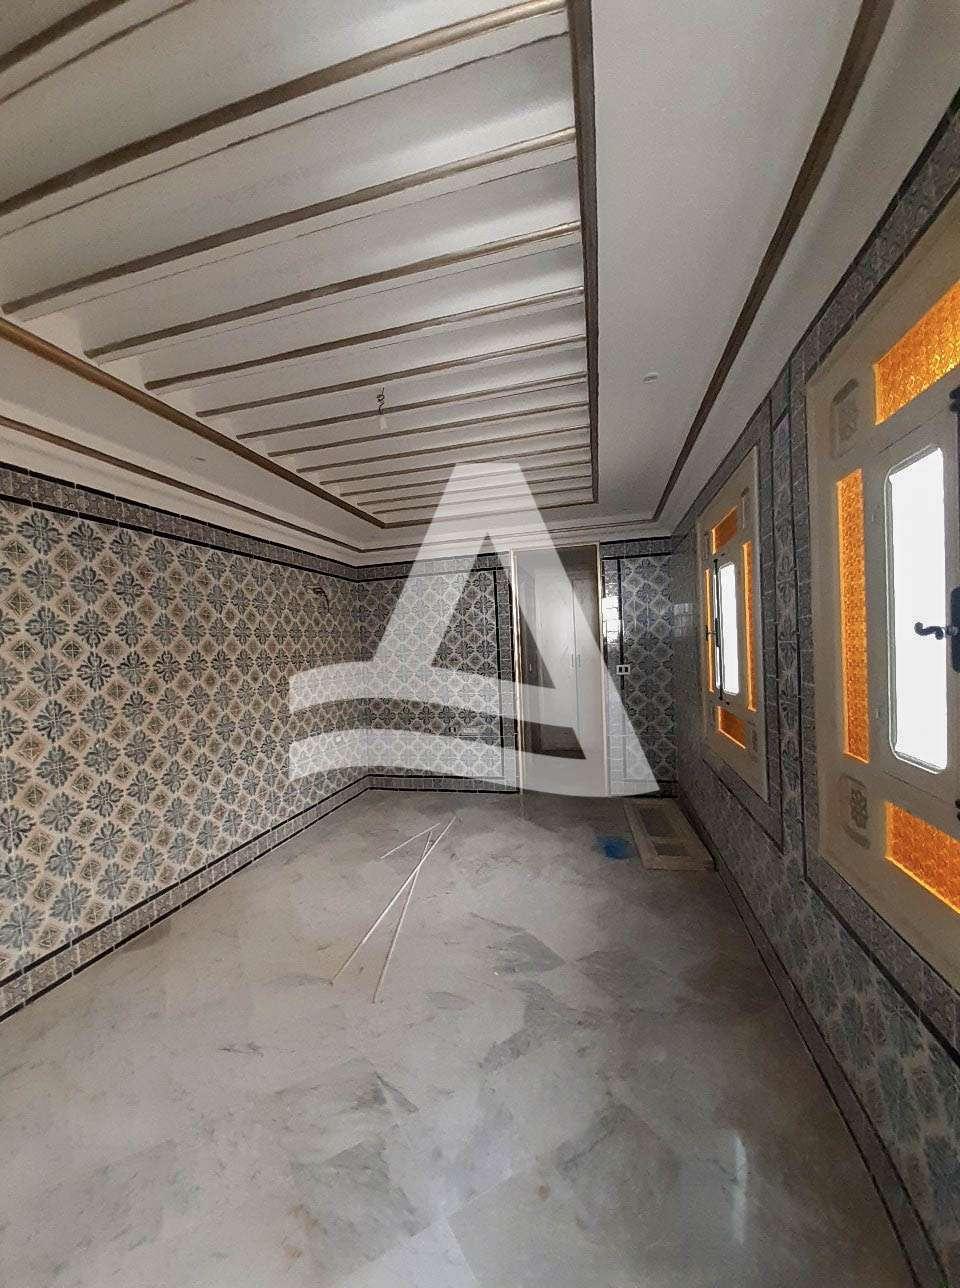 httpss3.amazonaws.comlogimoaws5286049471614686004Appartement_Marsa_Tunisie_